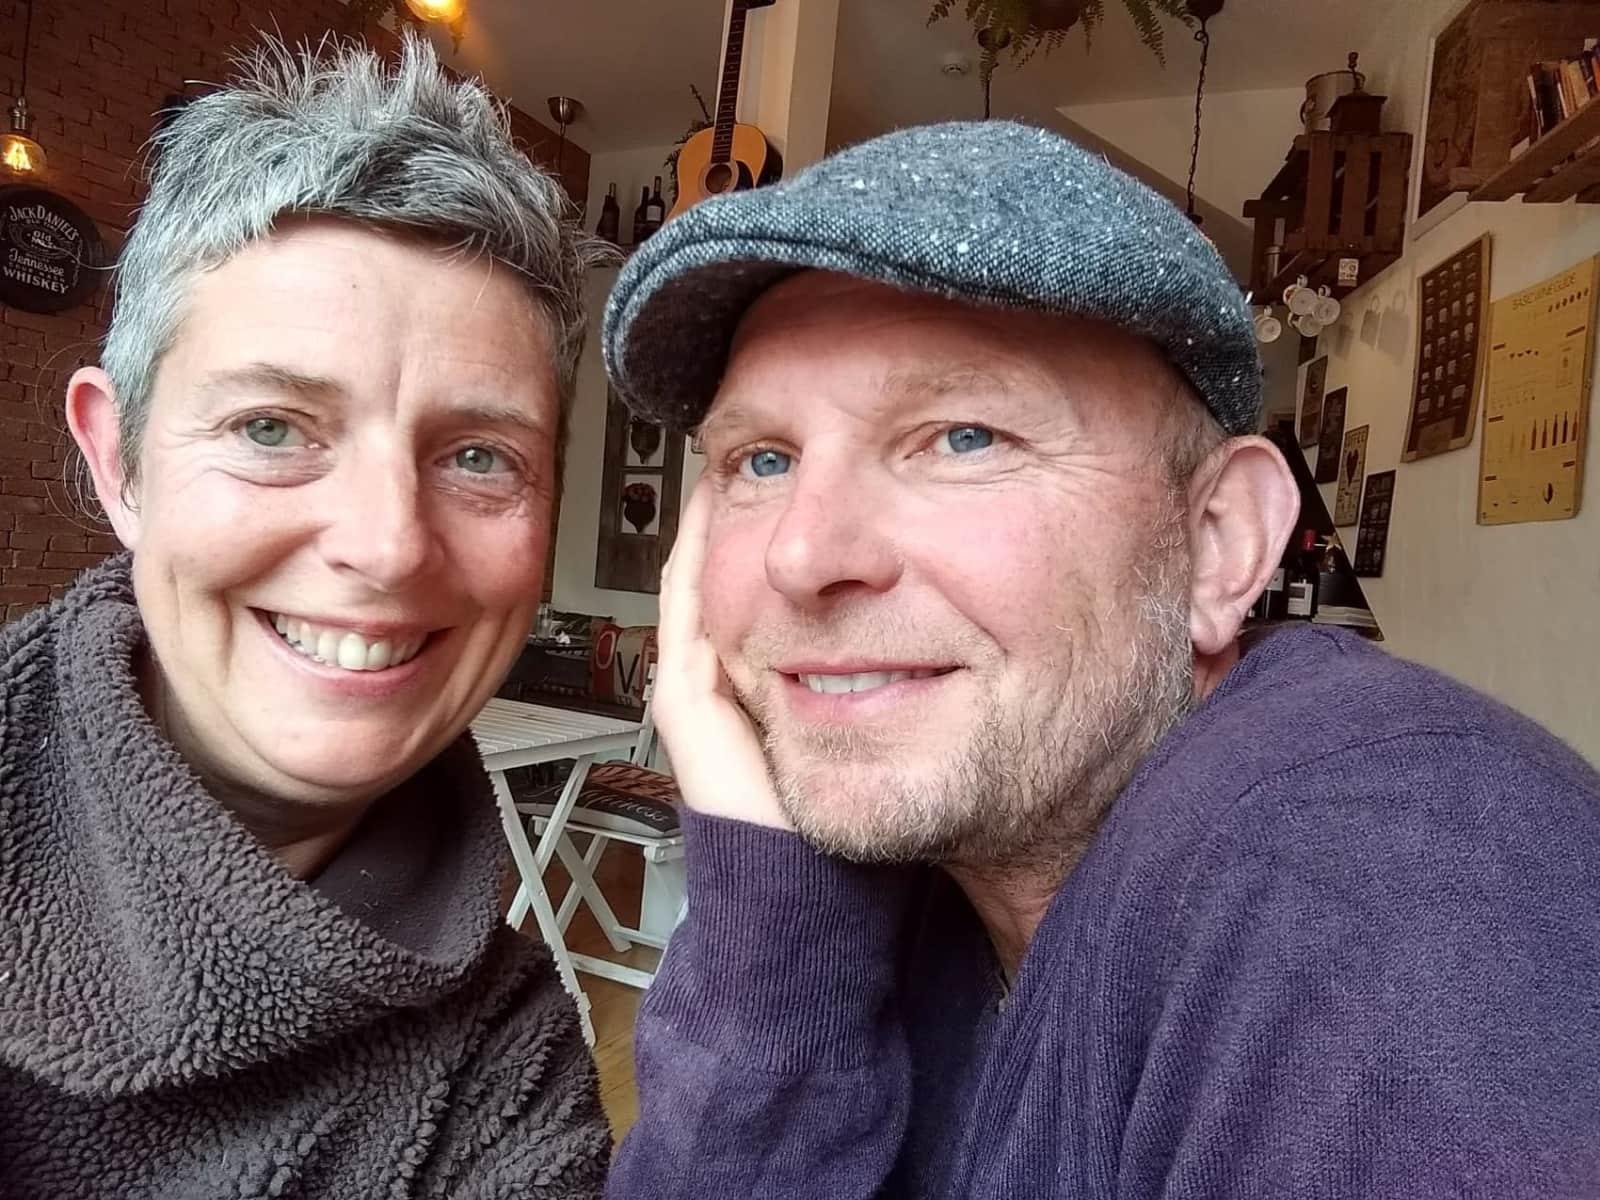 Lianne & Jon from Cardiff, United Kingdom